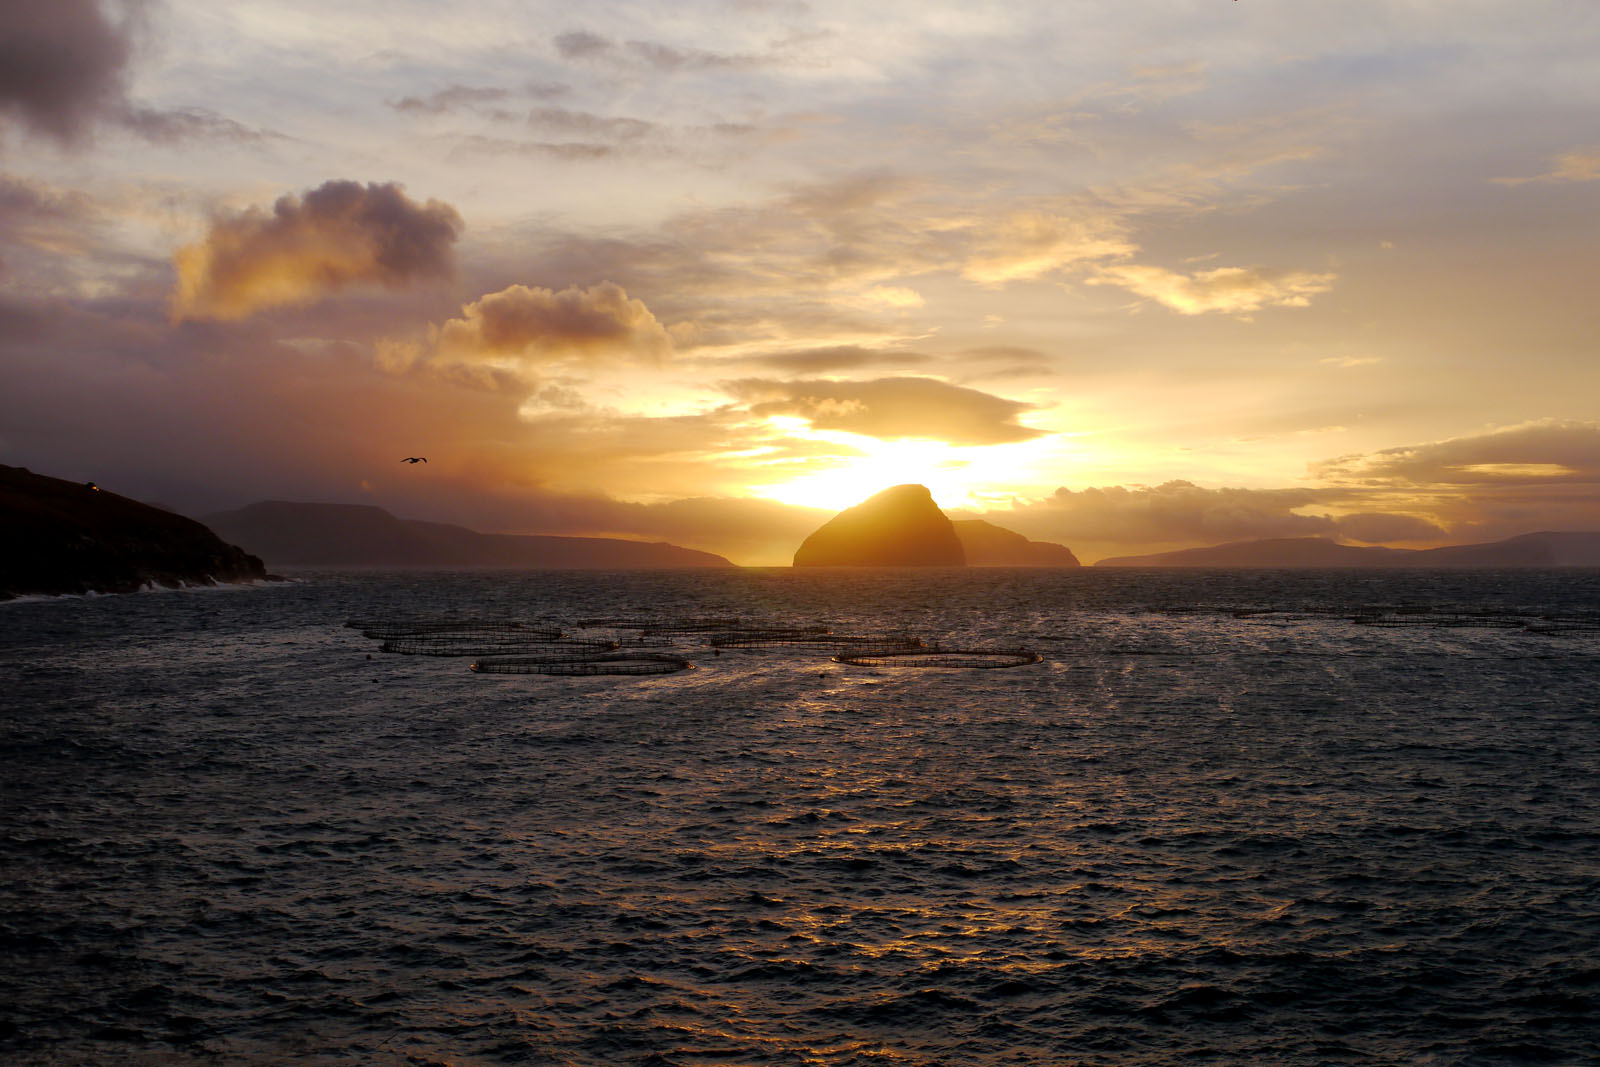 Sandavagur-Vagar-Sonnenaufgang-Meer-Koltur-Faroer Inseln